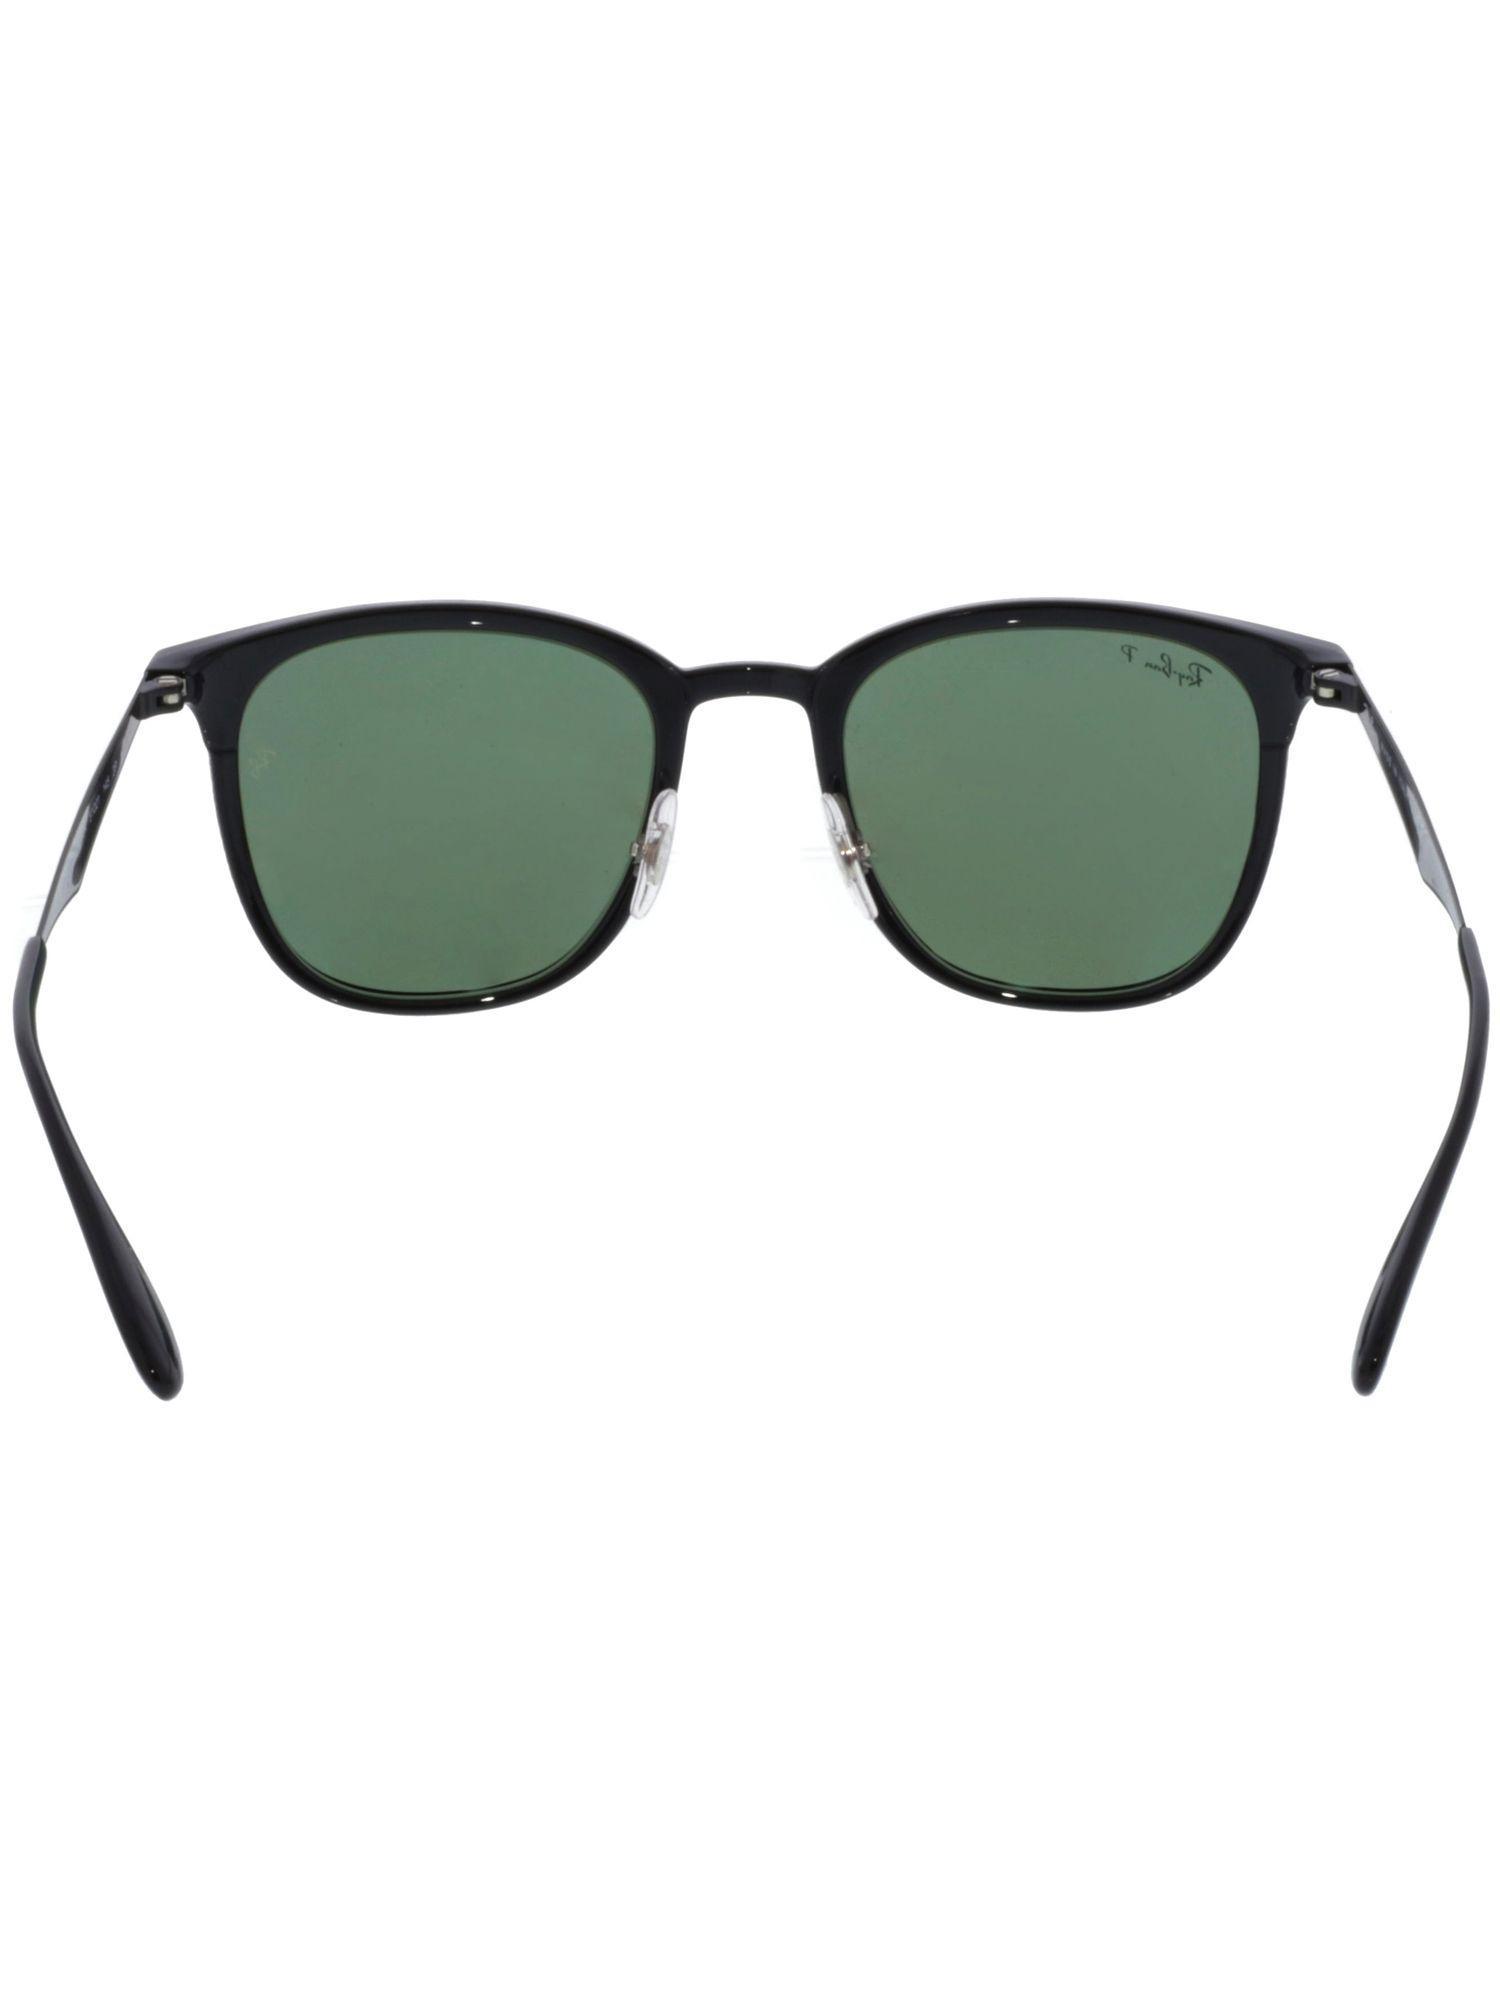 b9937d54f6b Lyst - Ray-Ban Rb4278-62829a-51 Black Square Sunglasses in Black